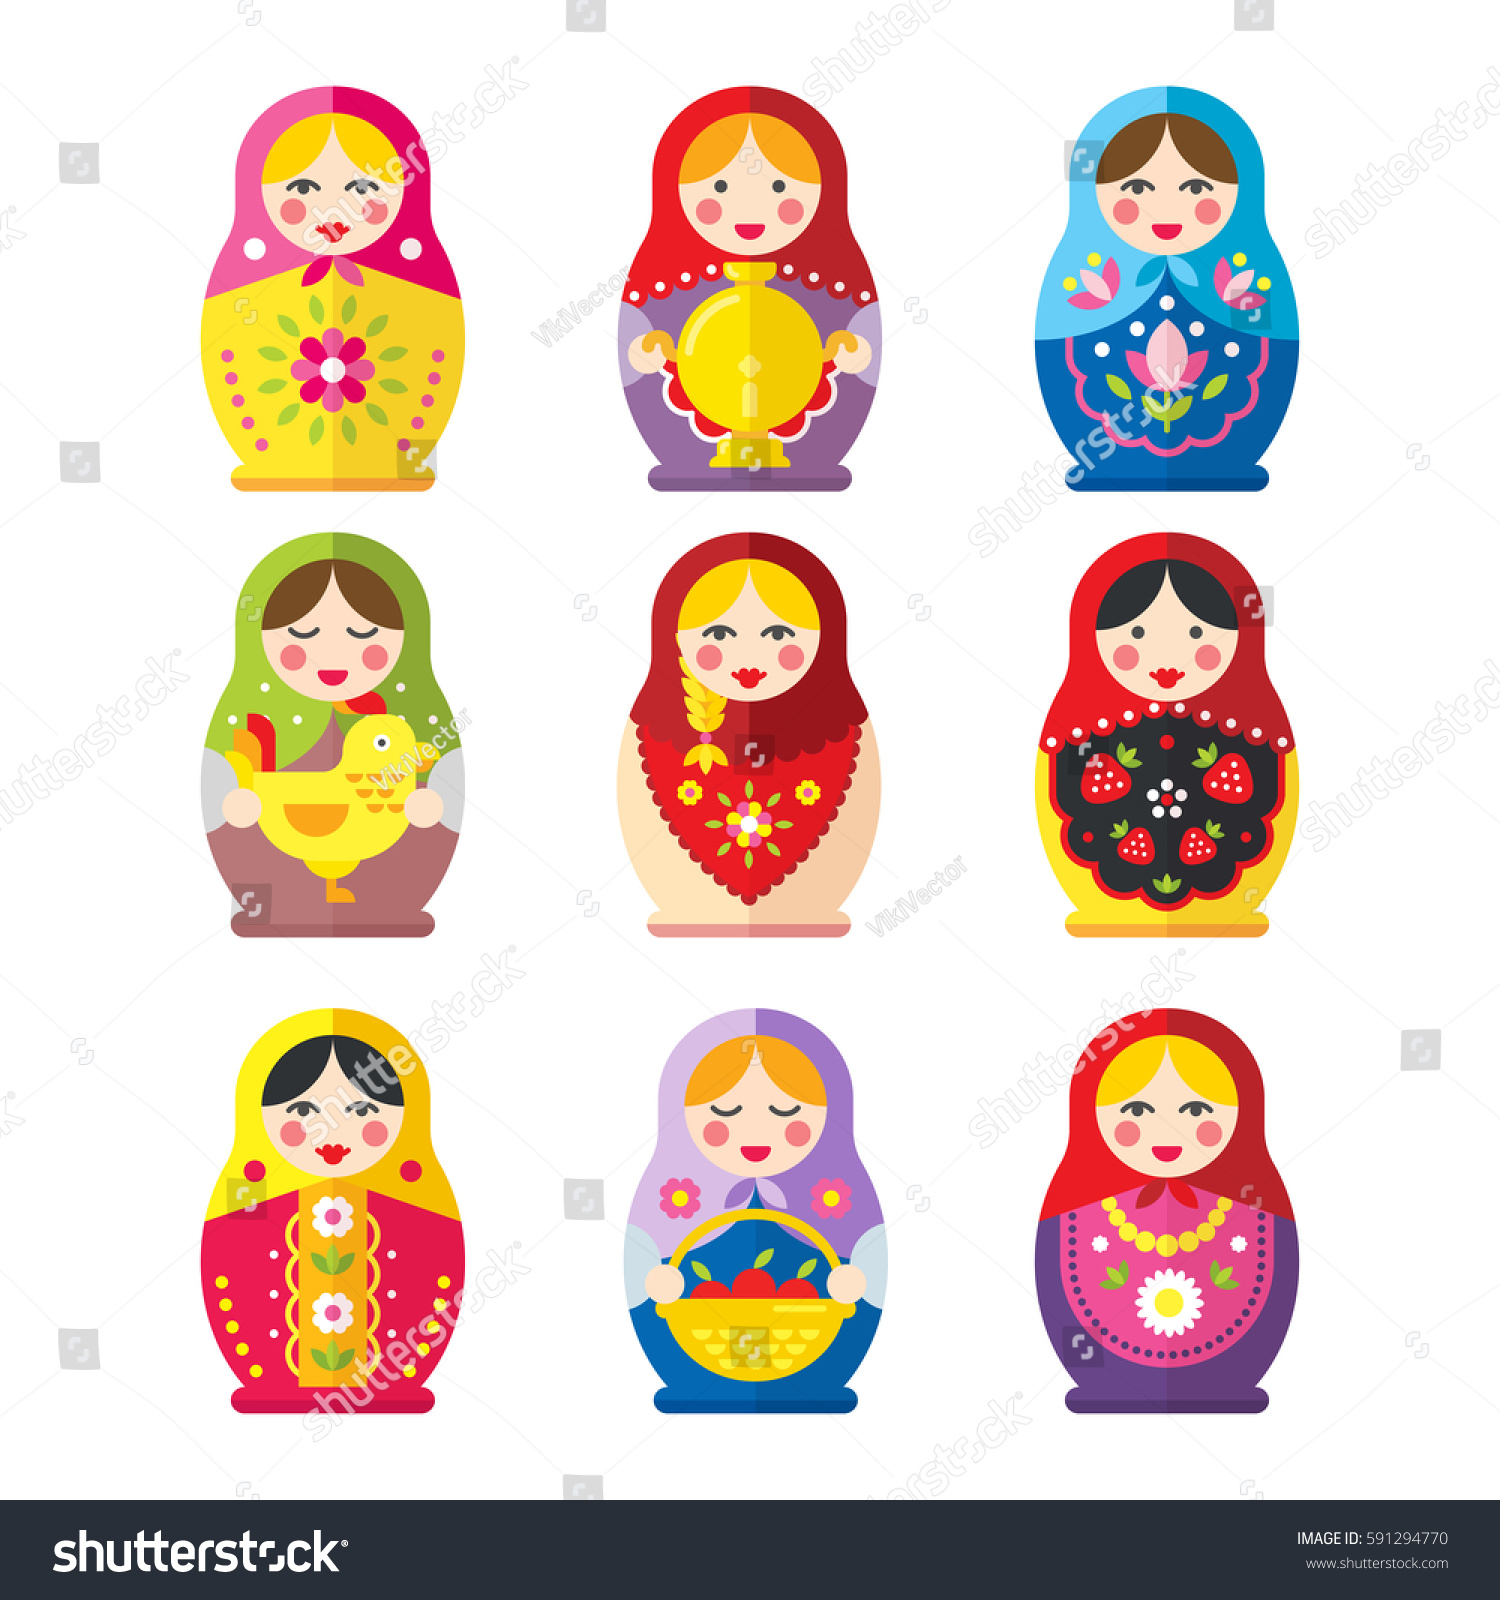 Set Russian Matryoshka Dolls Flat Style Stock Vector Royalty Free